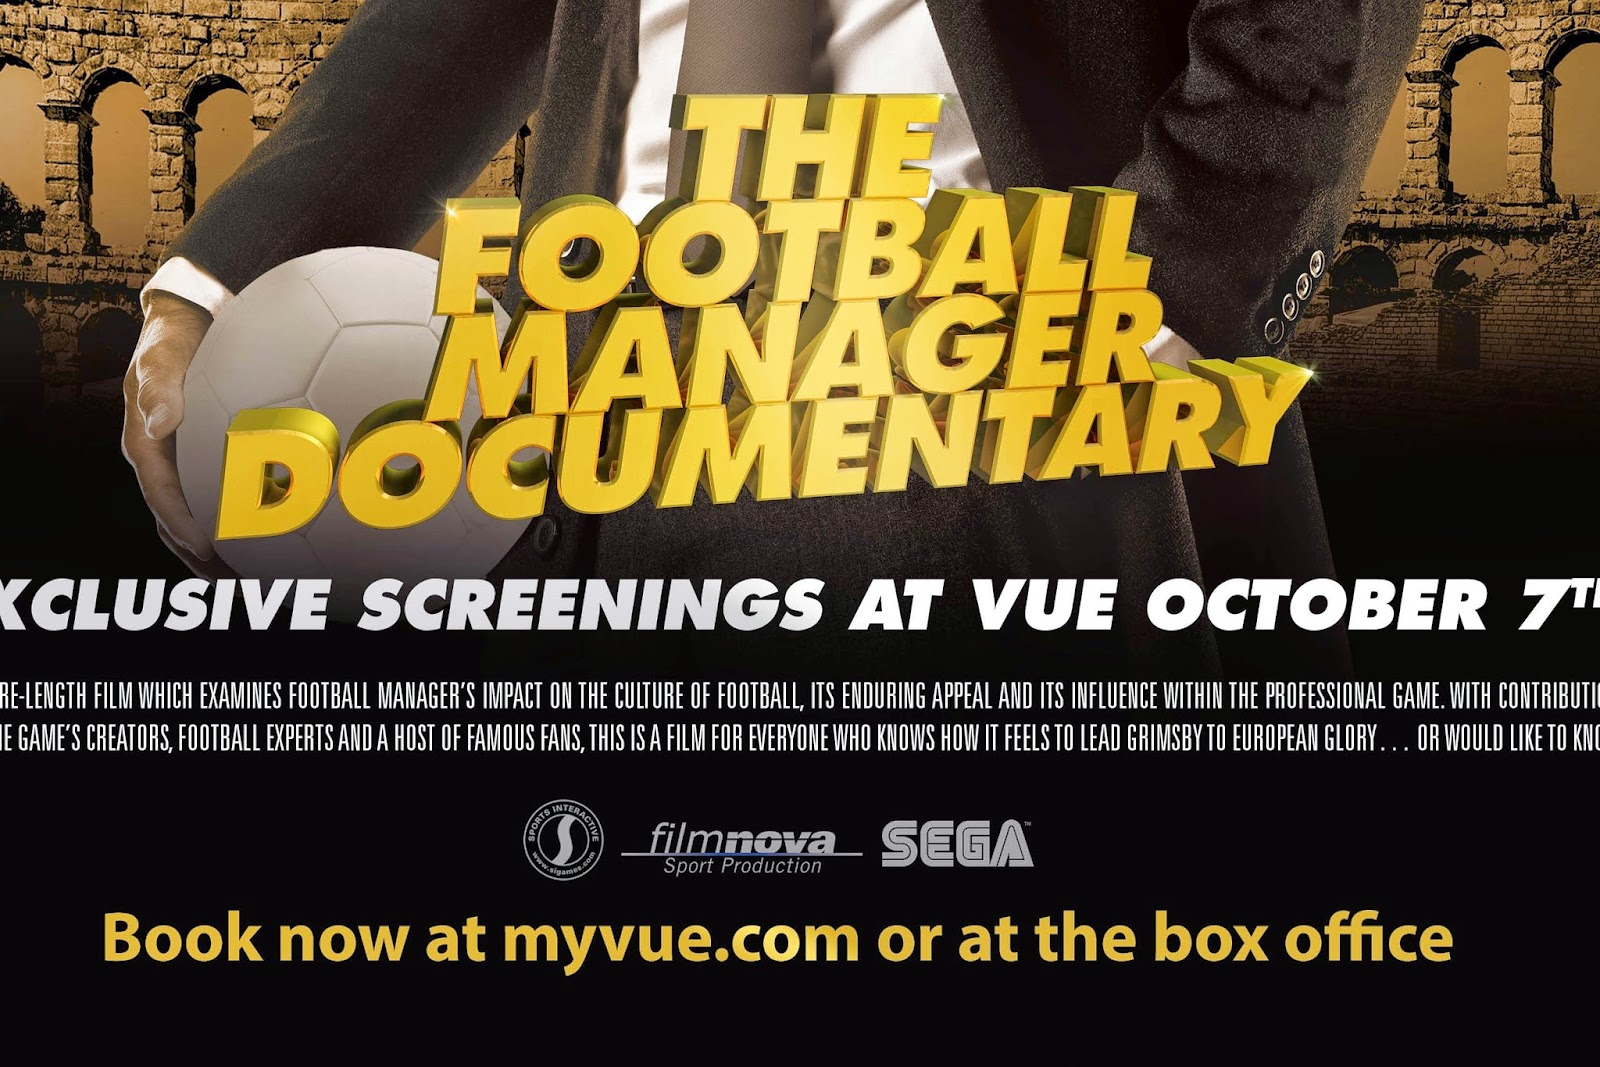 football manager documentary